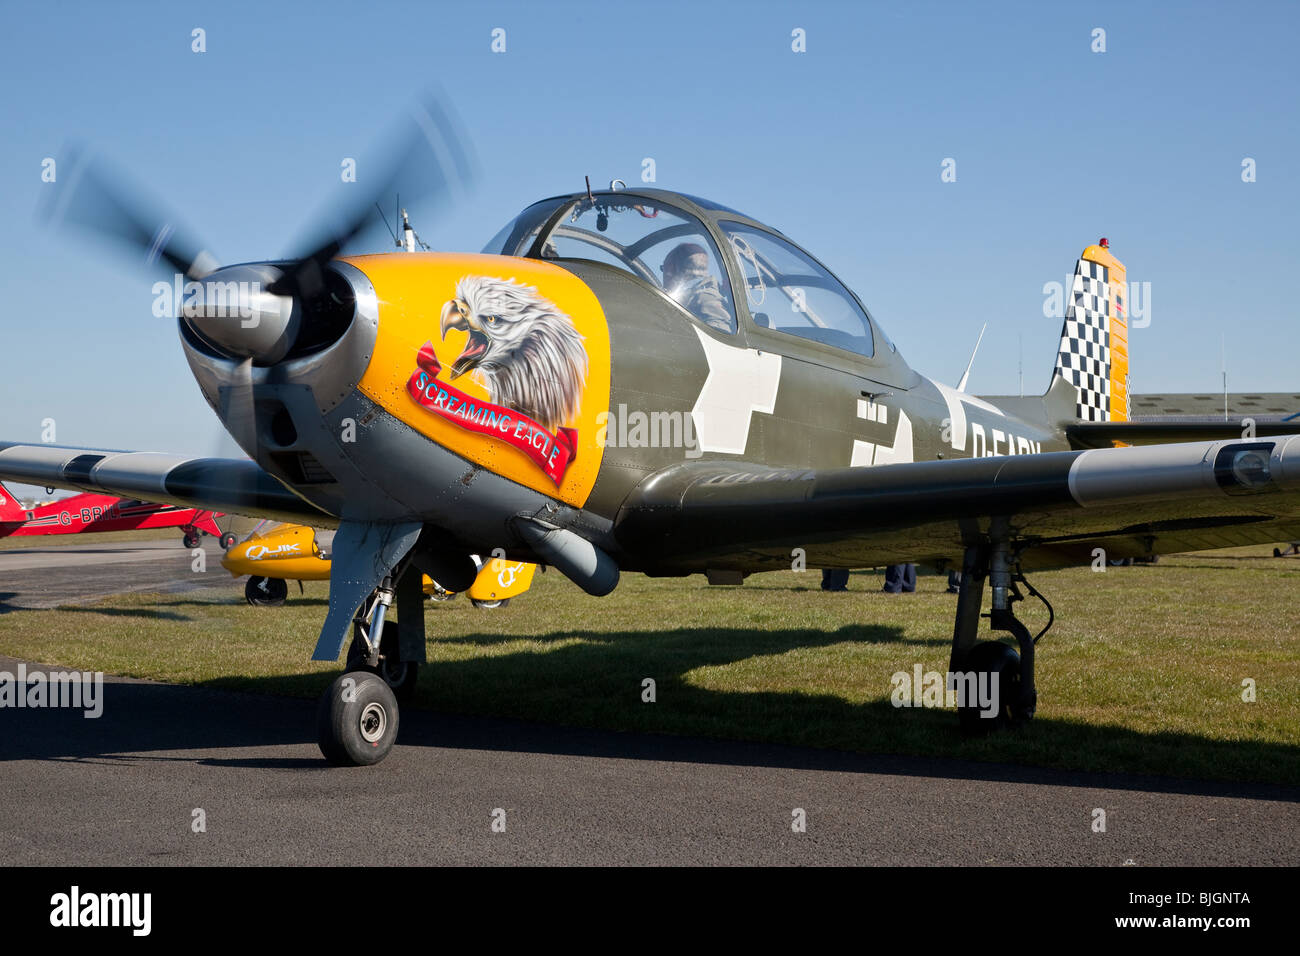 Focke-Wulf FWP-149D registered D-EARY, at Breighton - Stock Image